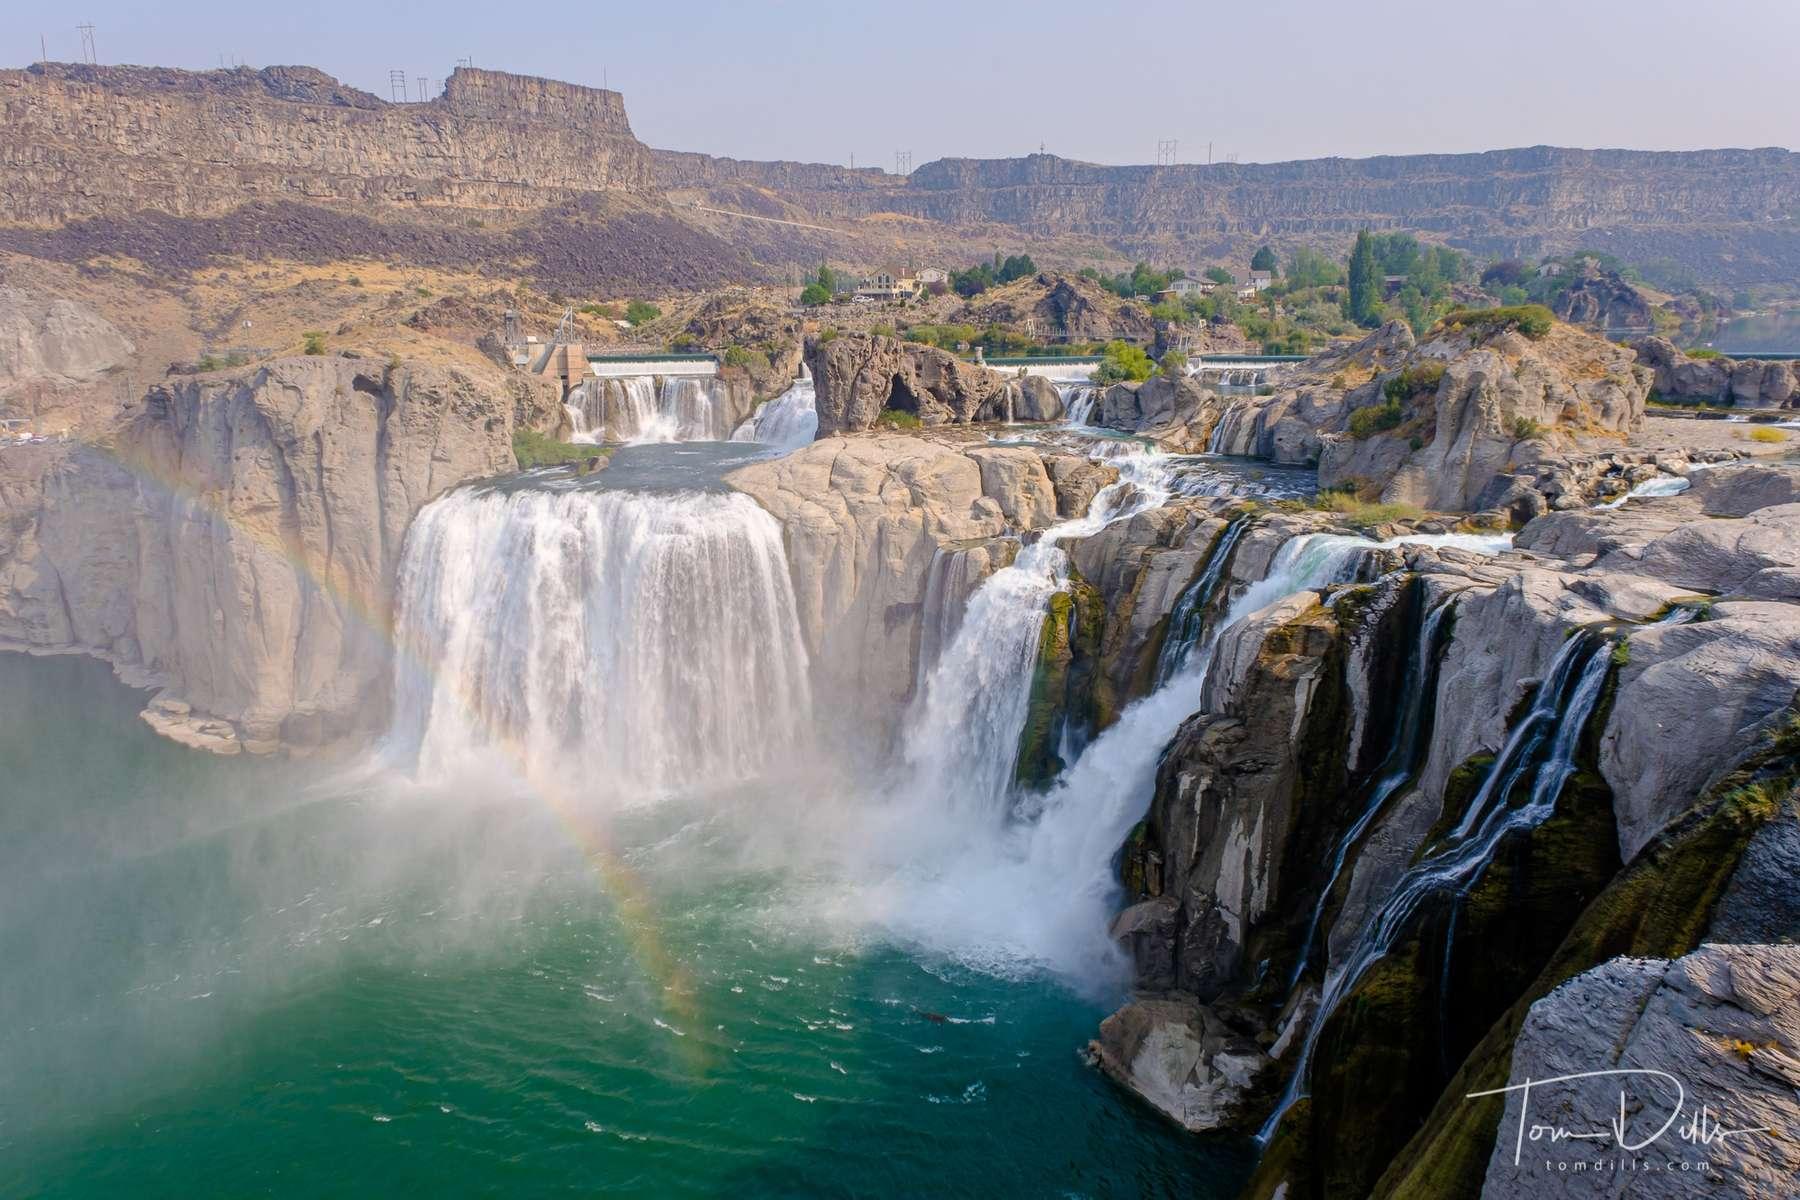 Shoshone Falls on the Snake River near Twin Falls, Idaho